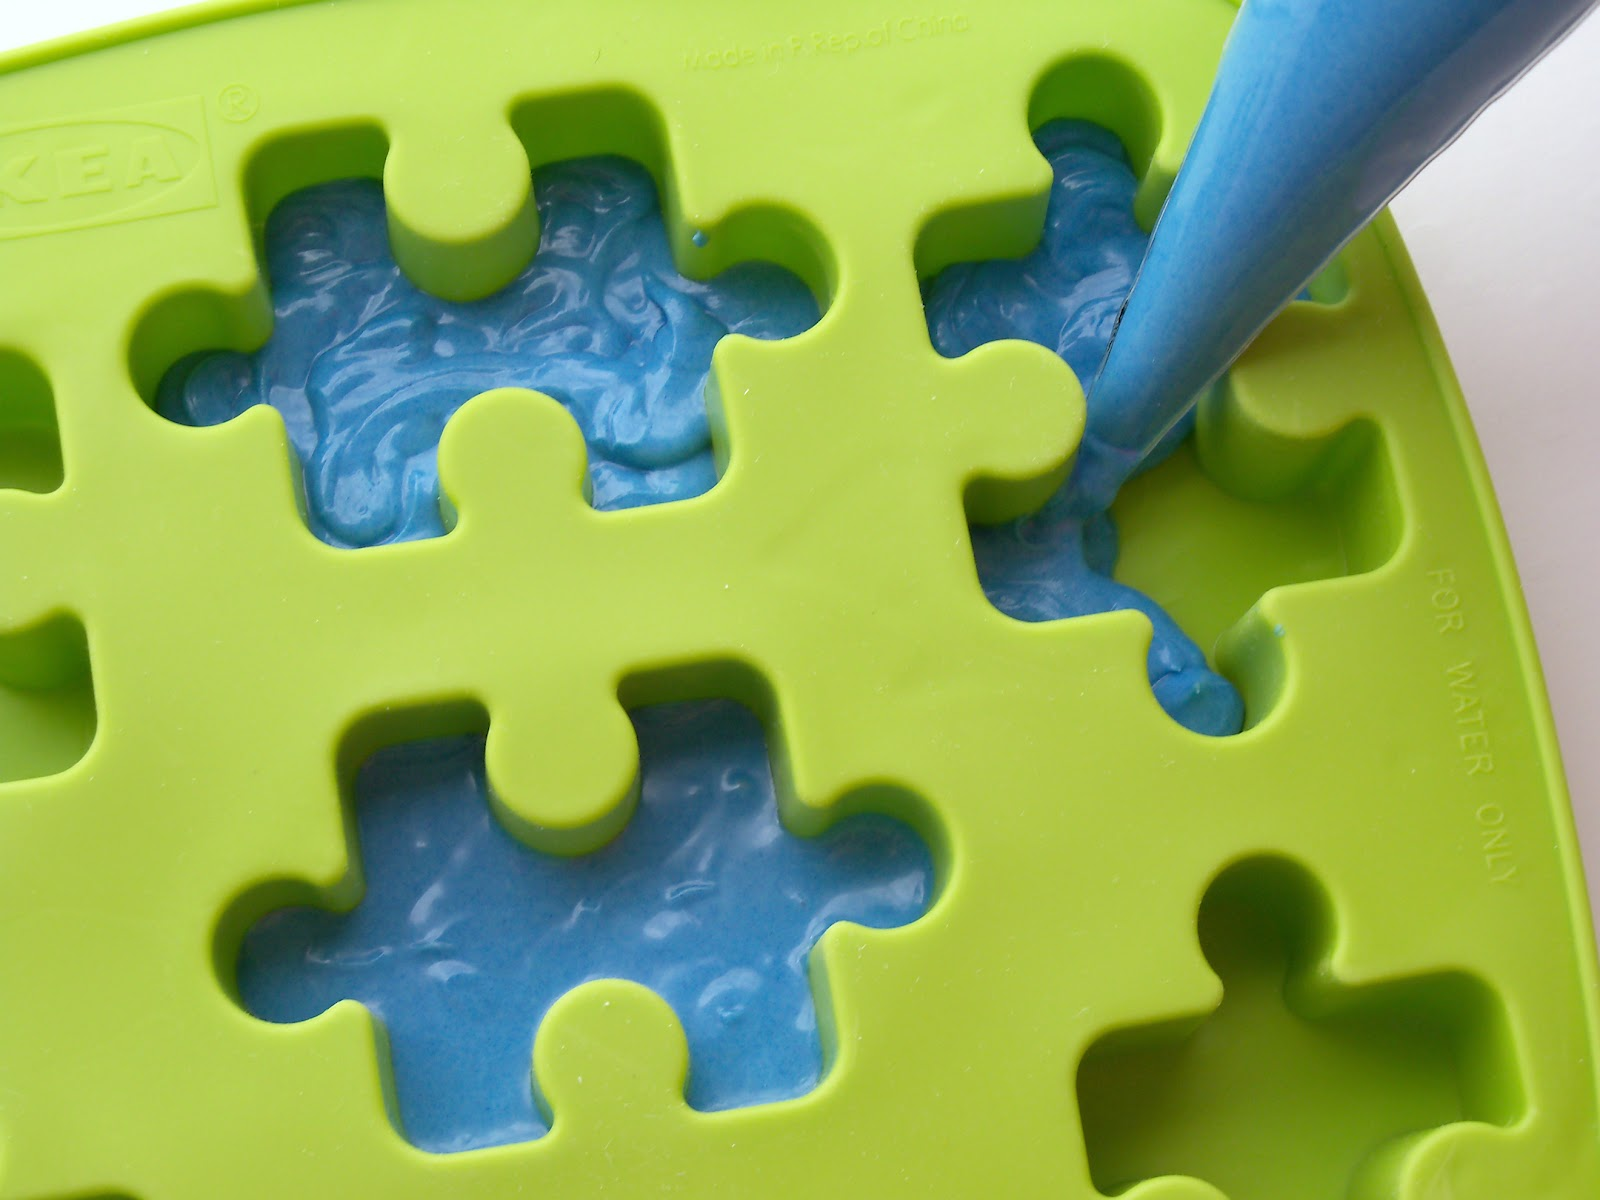 Candied Cake Decoration Crossword : Bird On A Cake: Puzzle Piece Cake